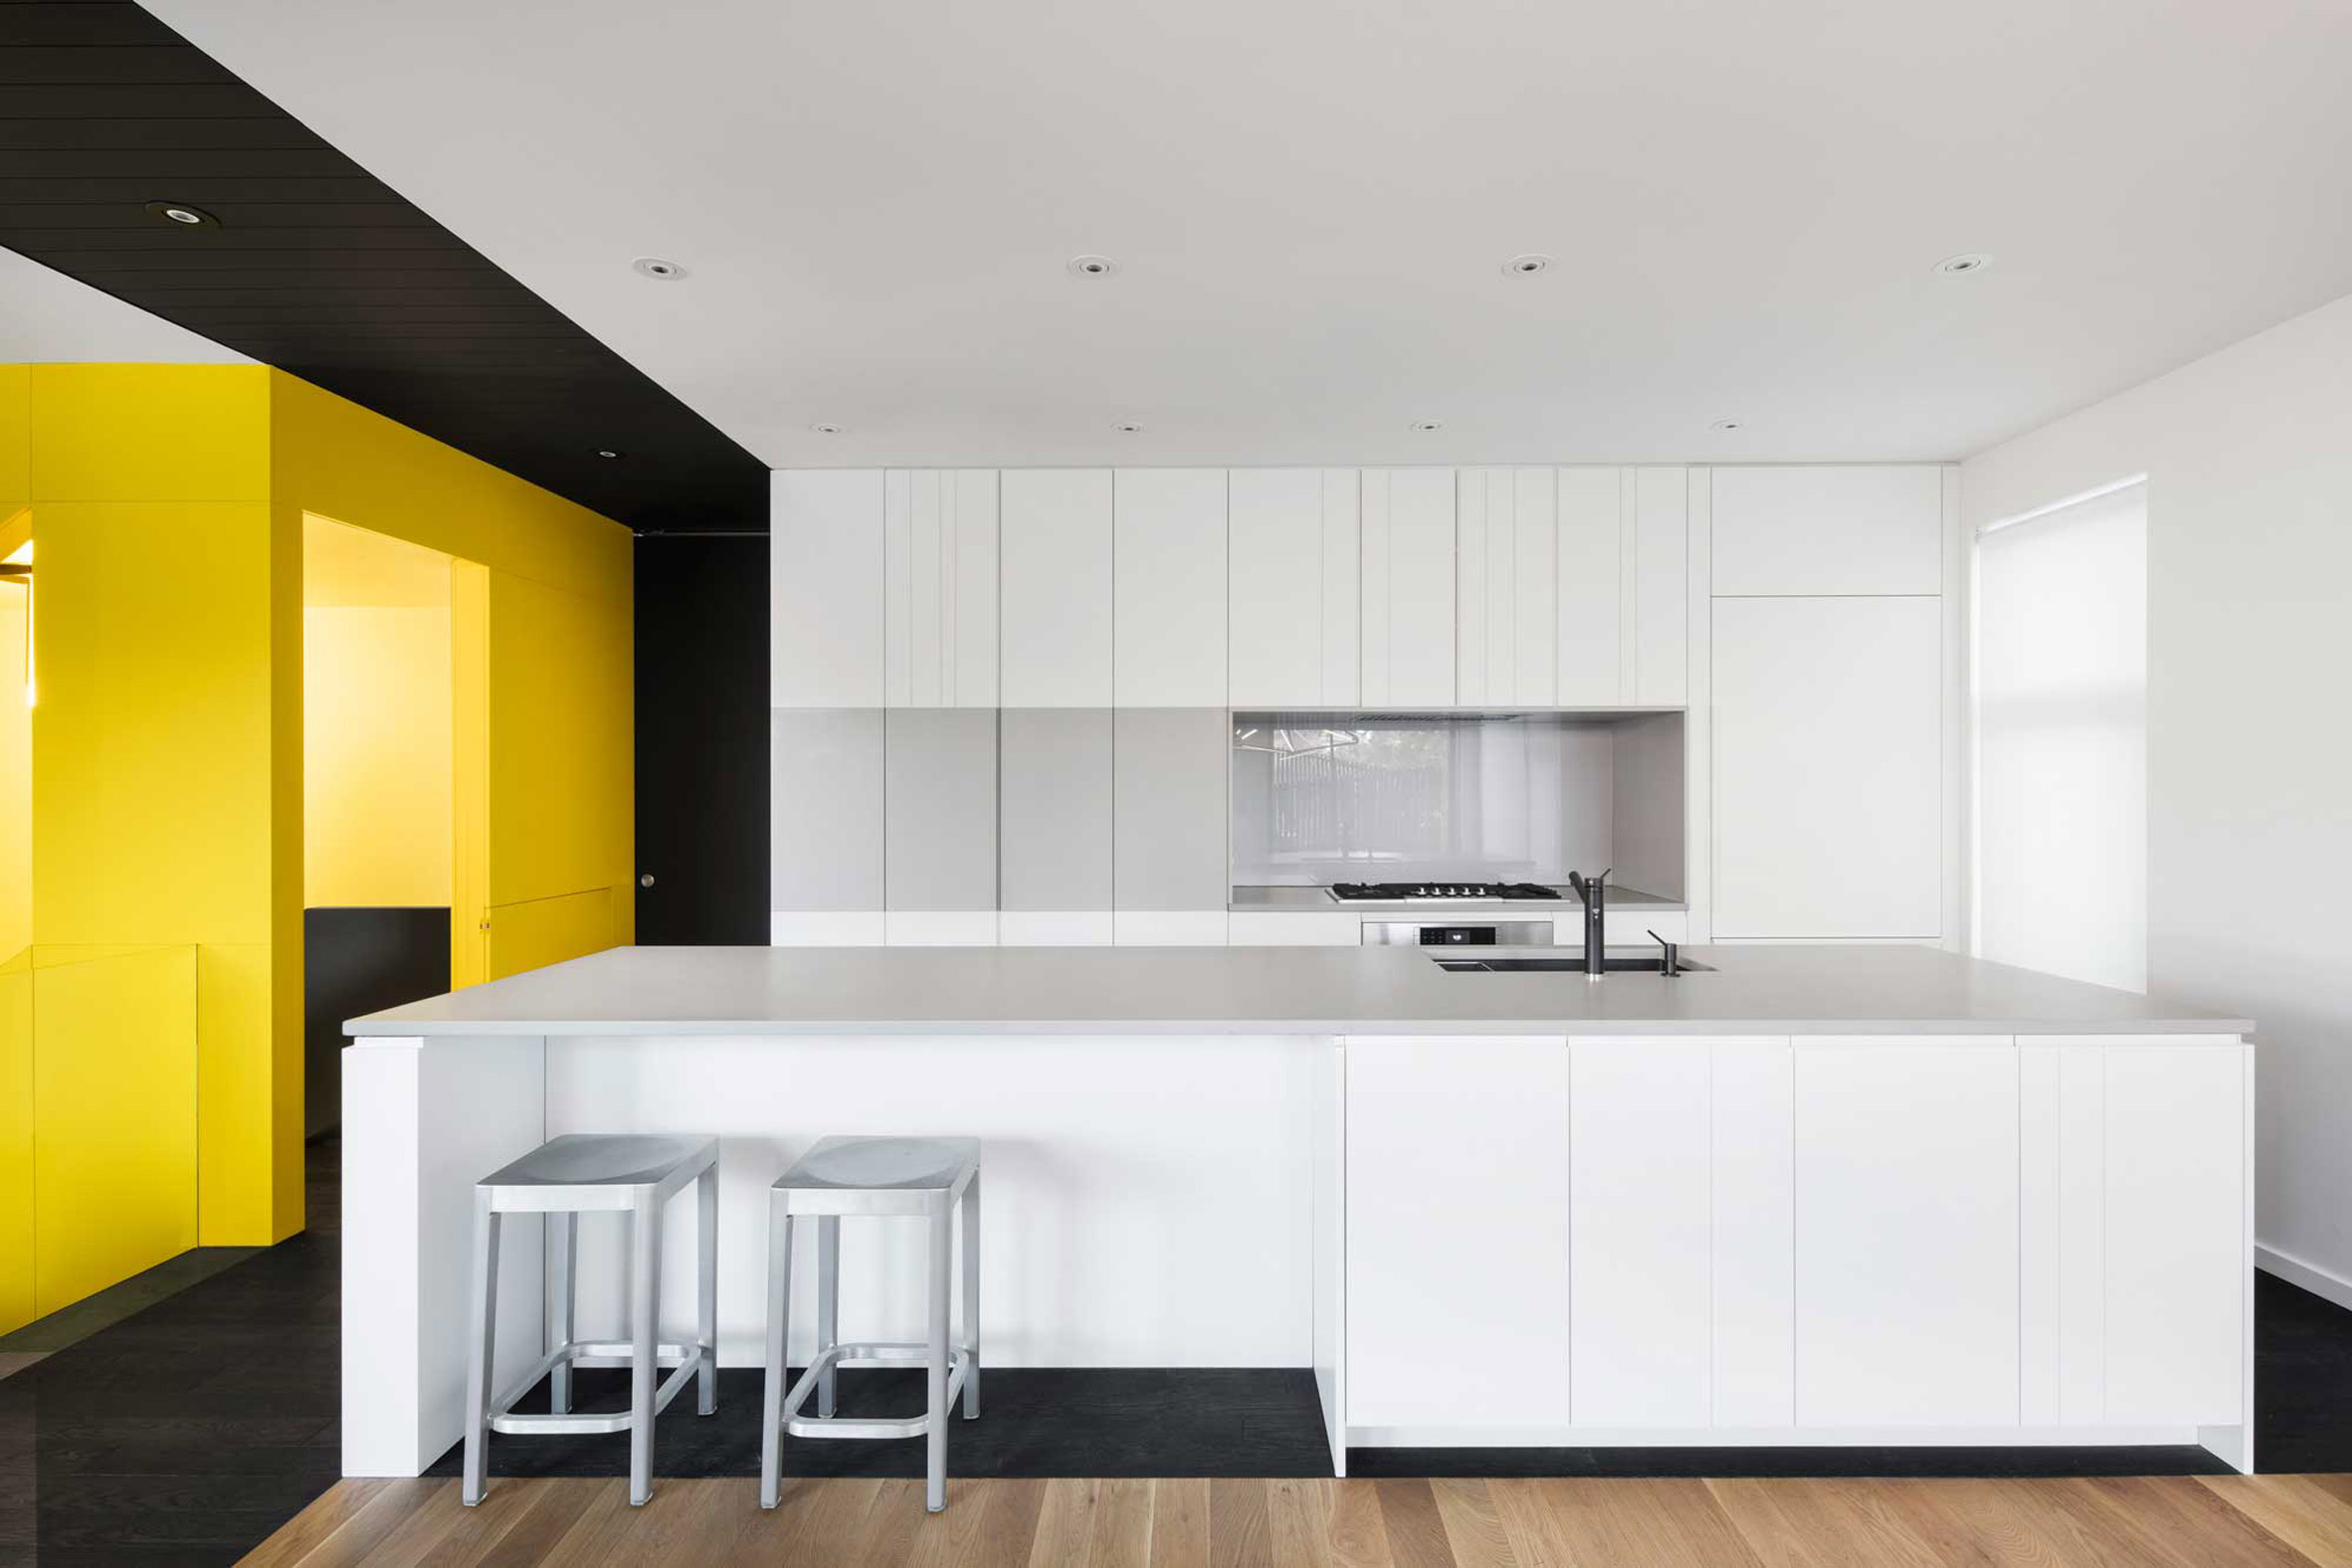 canari-house-residential-architecture-naturehumaine-montreal-quebec-canada_dezeen_2364_col_13